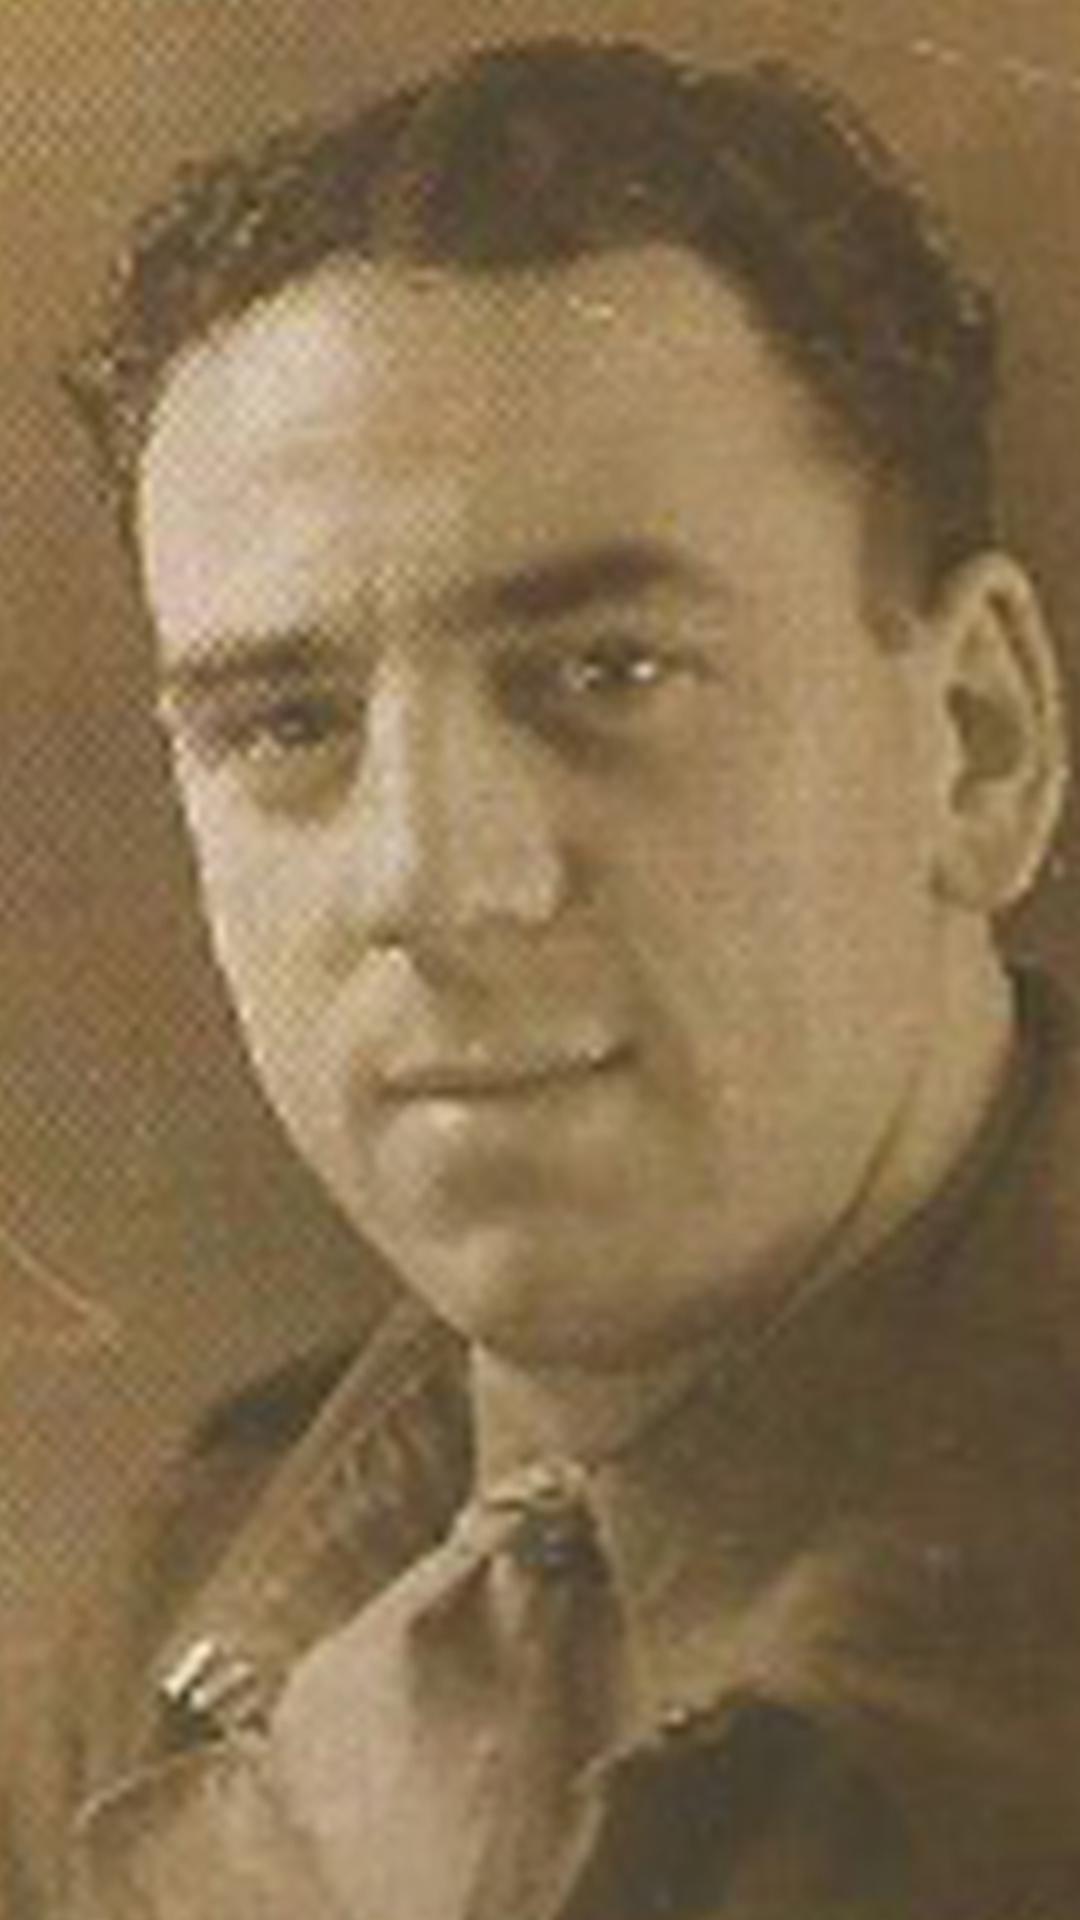 Joe in 1941, North Africa Campaign